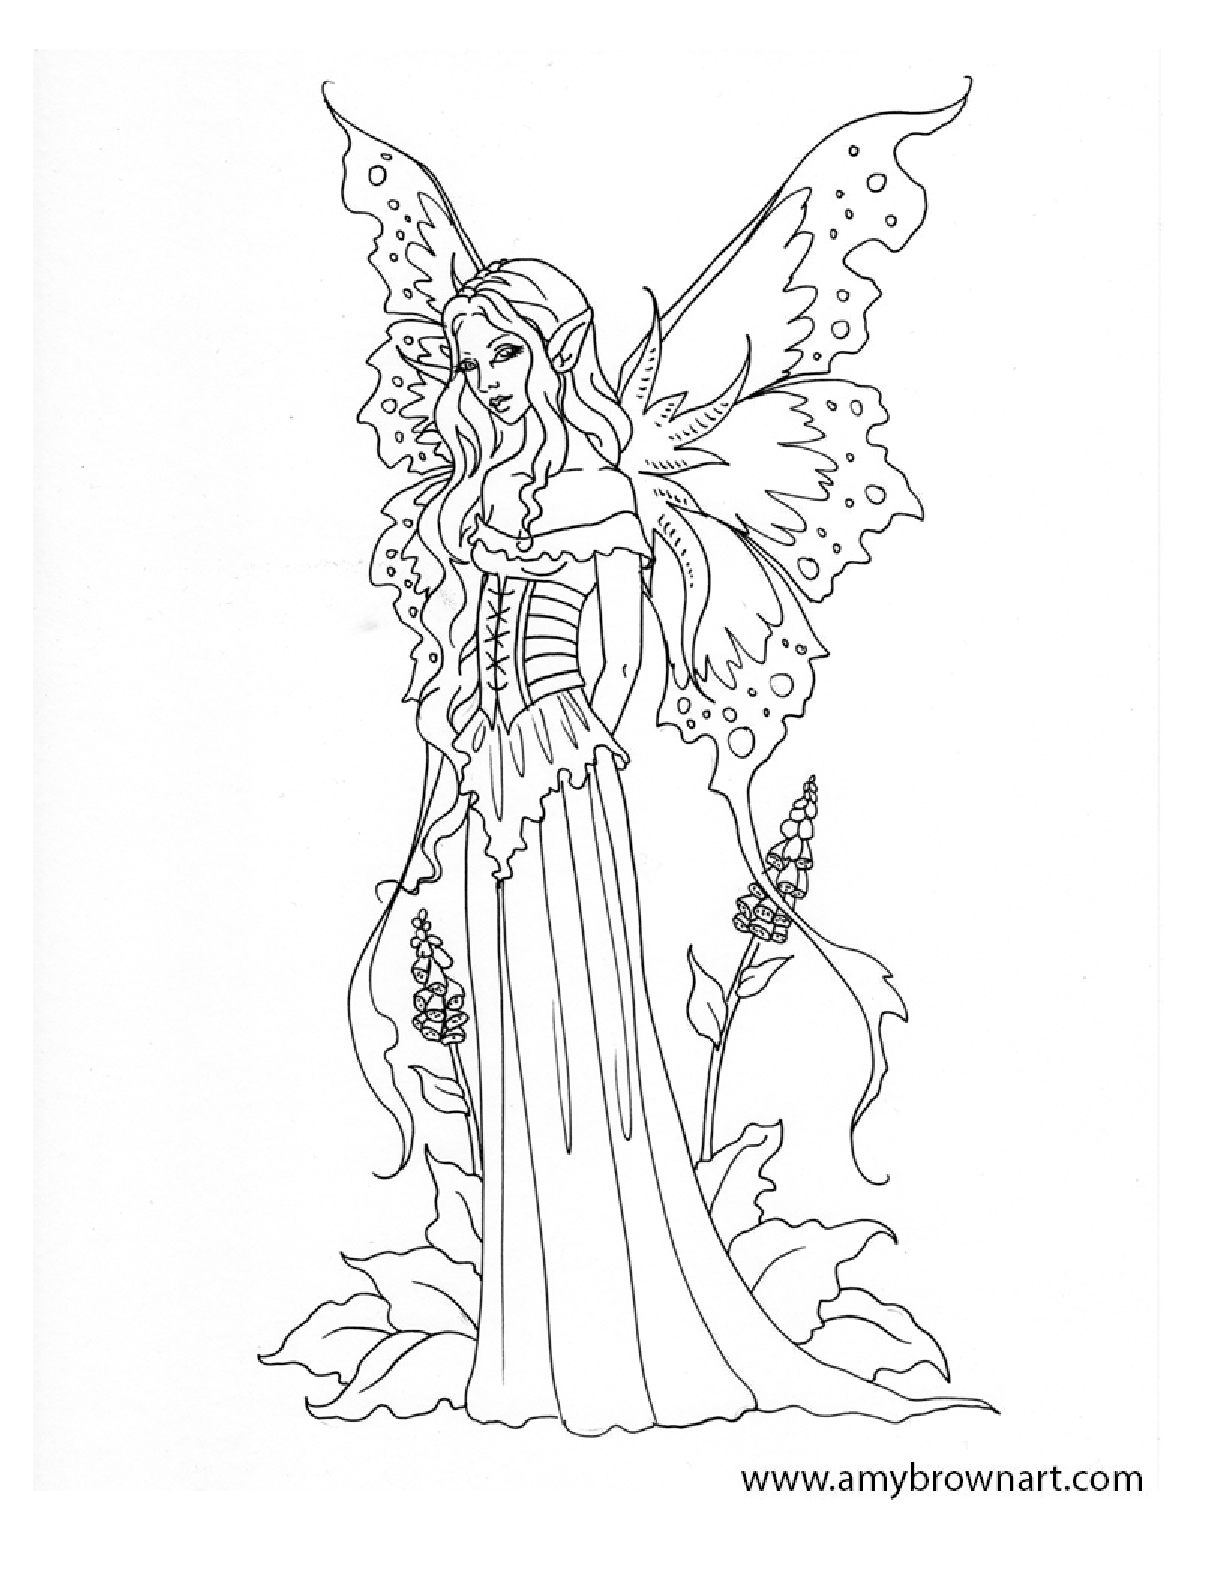 Grosser Mythen coloring #13, Download drawings